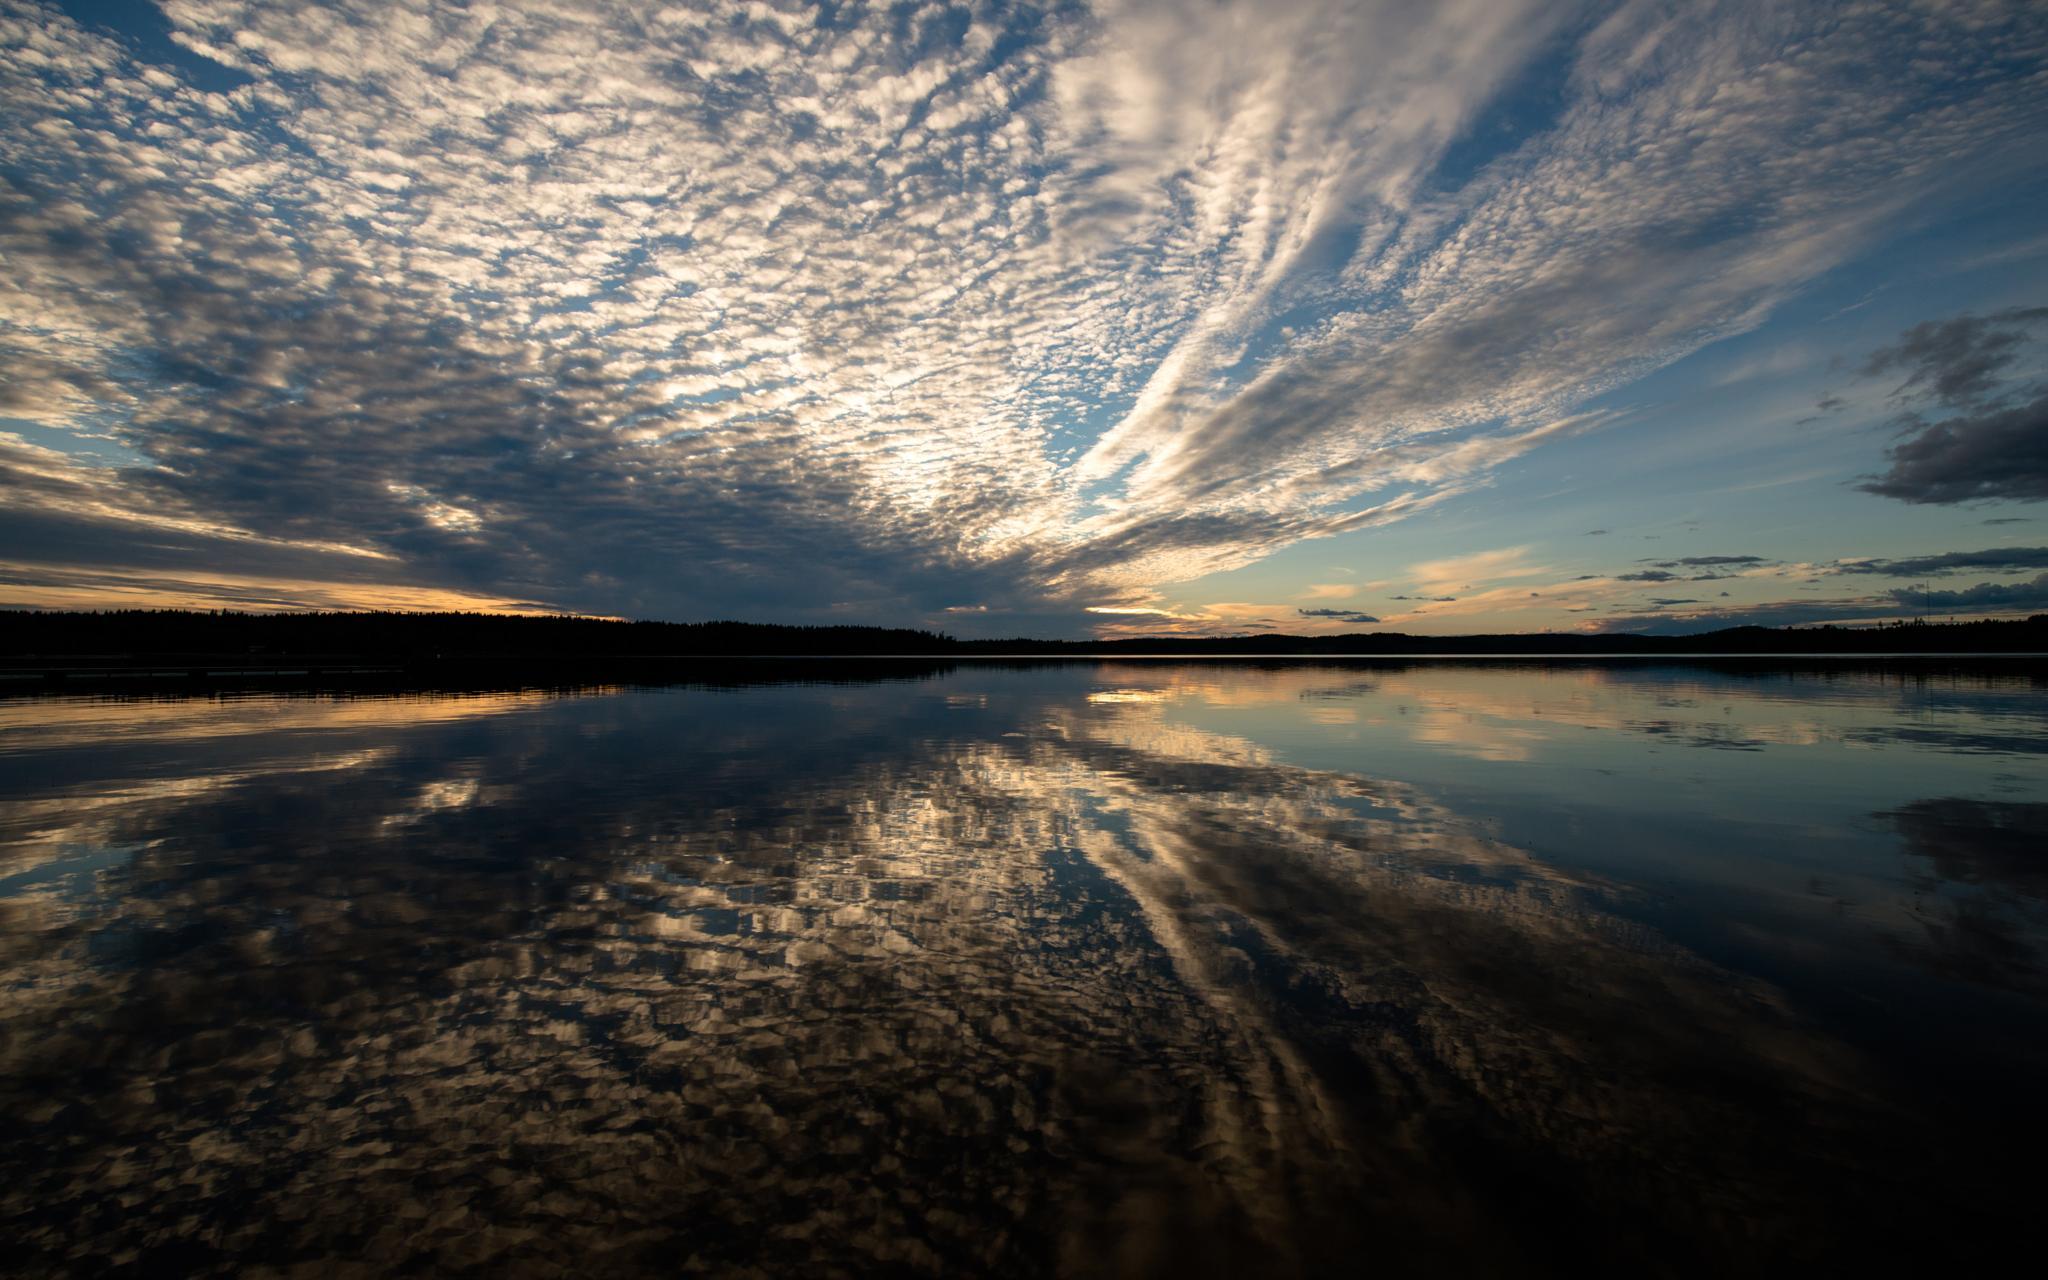 sunset by Skidbladner Salomonsson